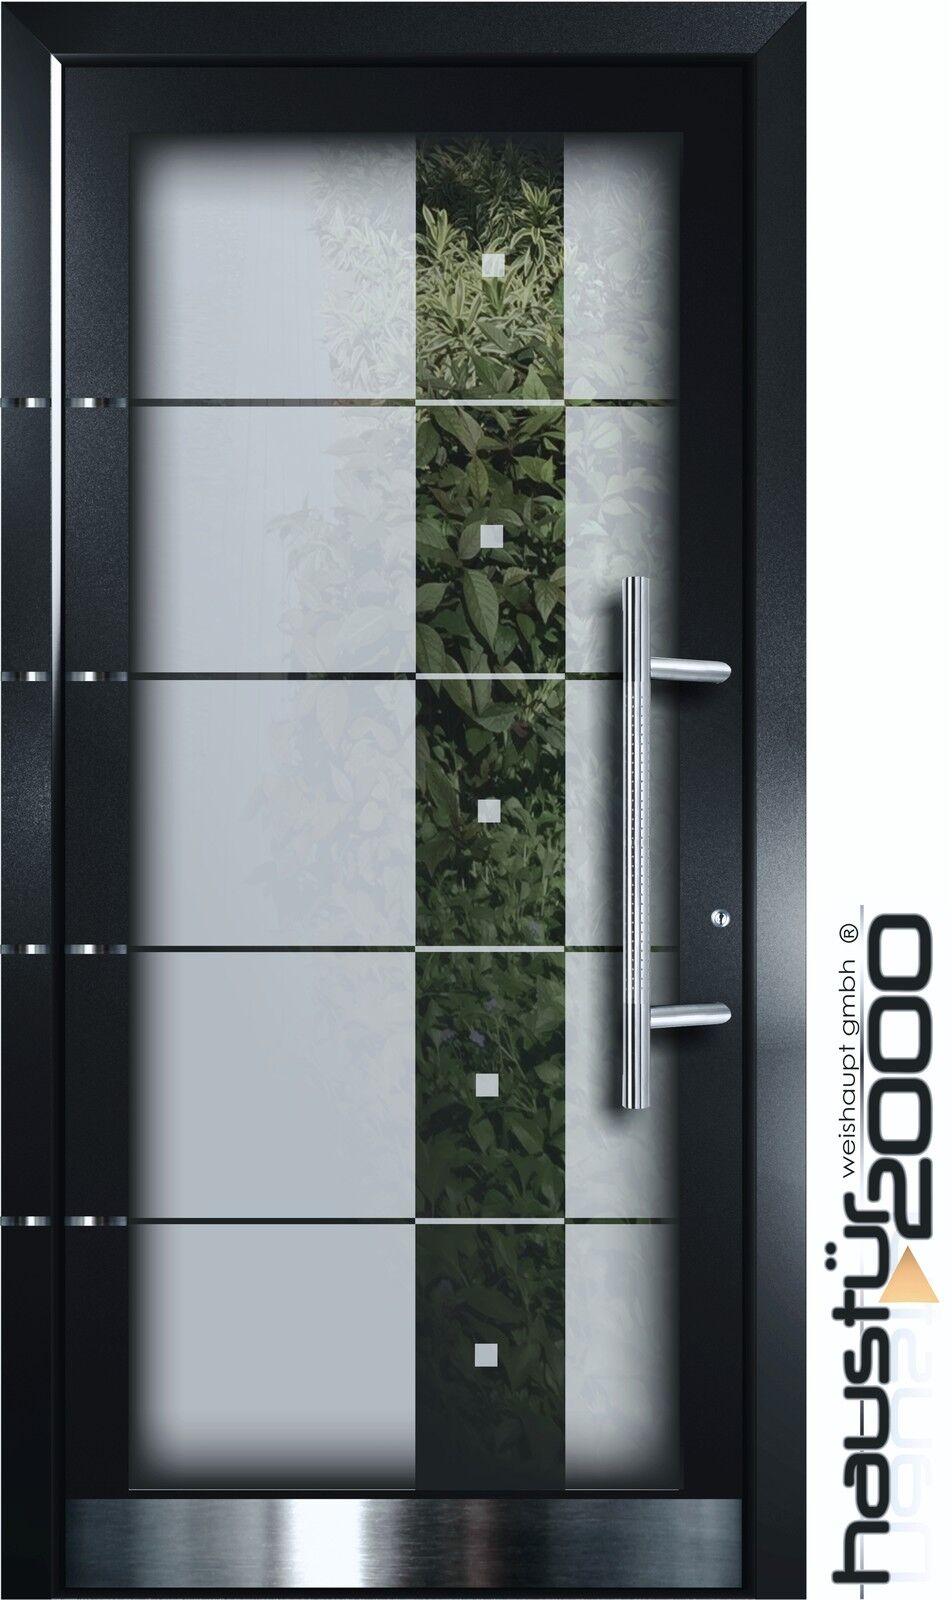 HAUSTÜR2000® Aluminium Haustür Ganzglasfüllung Alu Tür n. Maß Mod. HT 5332 GLA